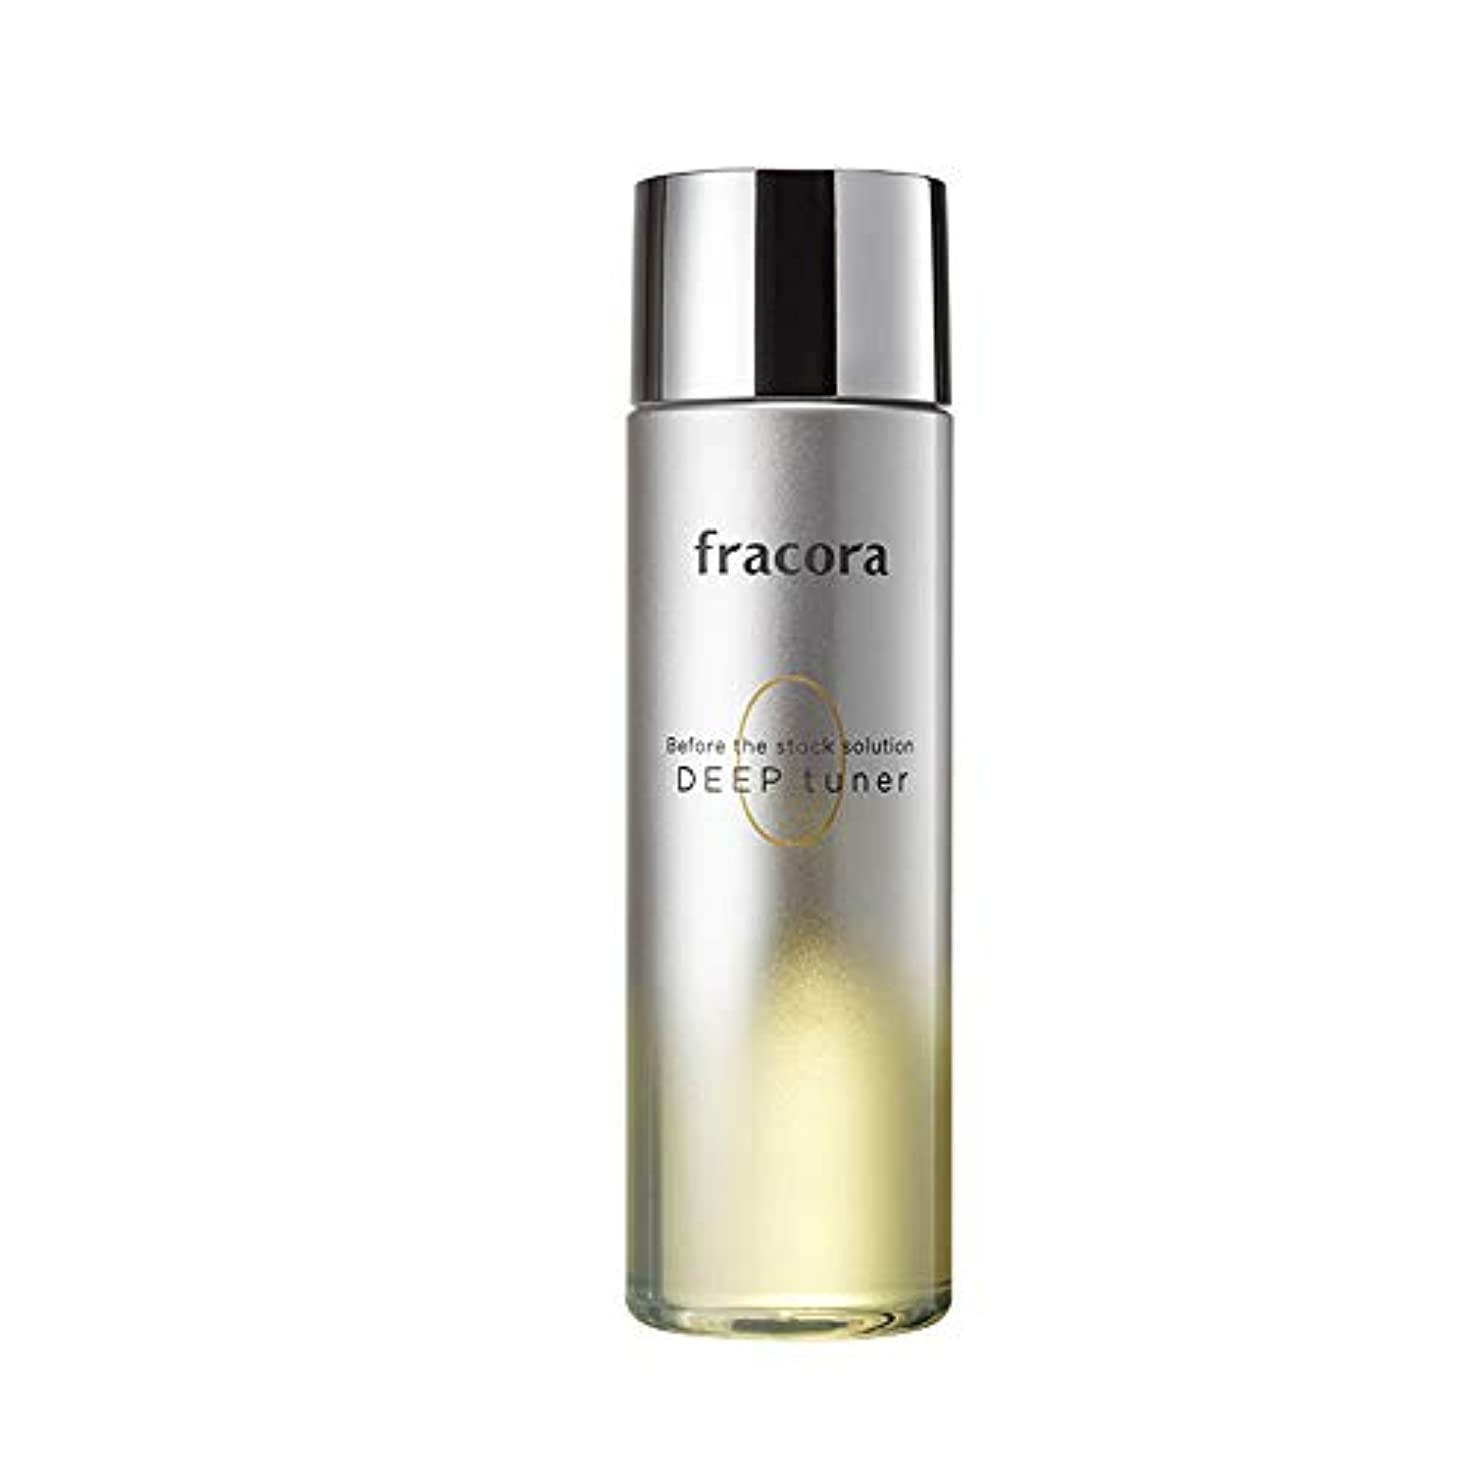 fracora(フラコラ) 保湿液 ディープ チューナー 120mL